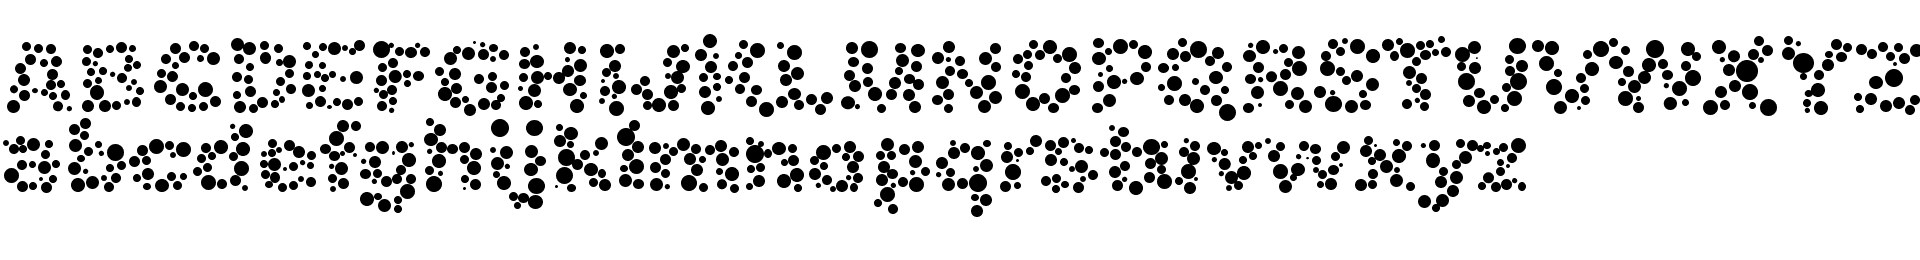 Alphabet_05